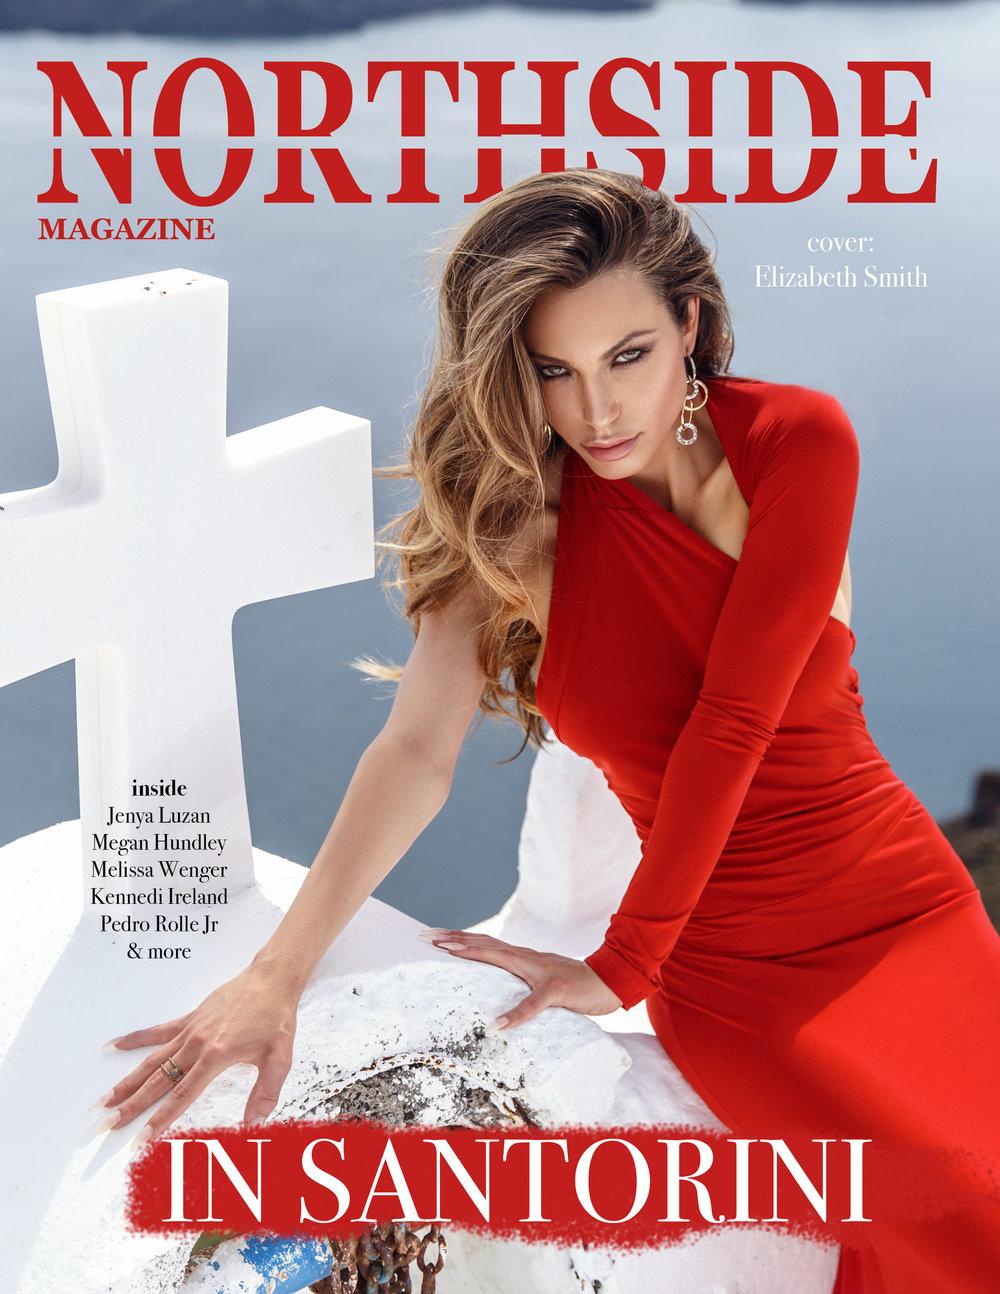 NorthsideMagazine_Vol18_Cover.jpg